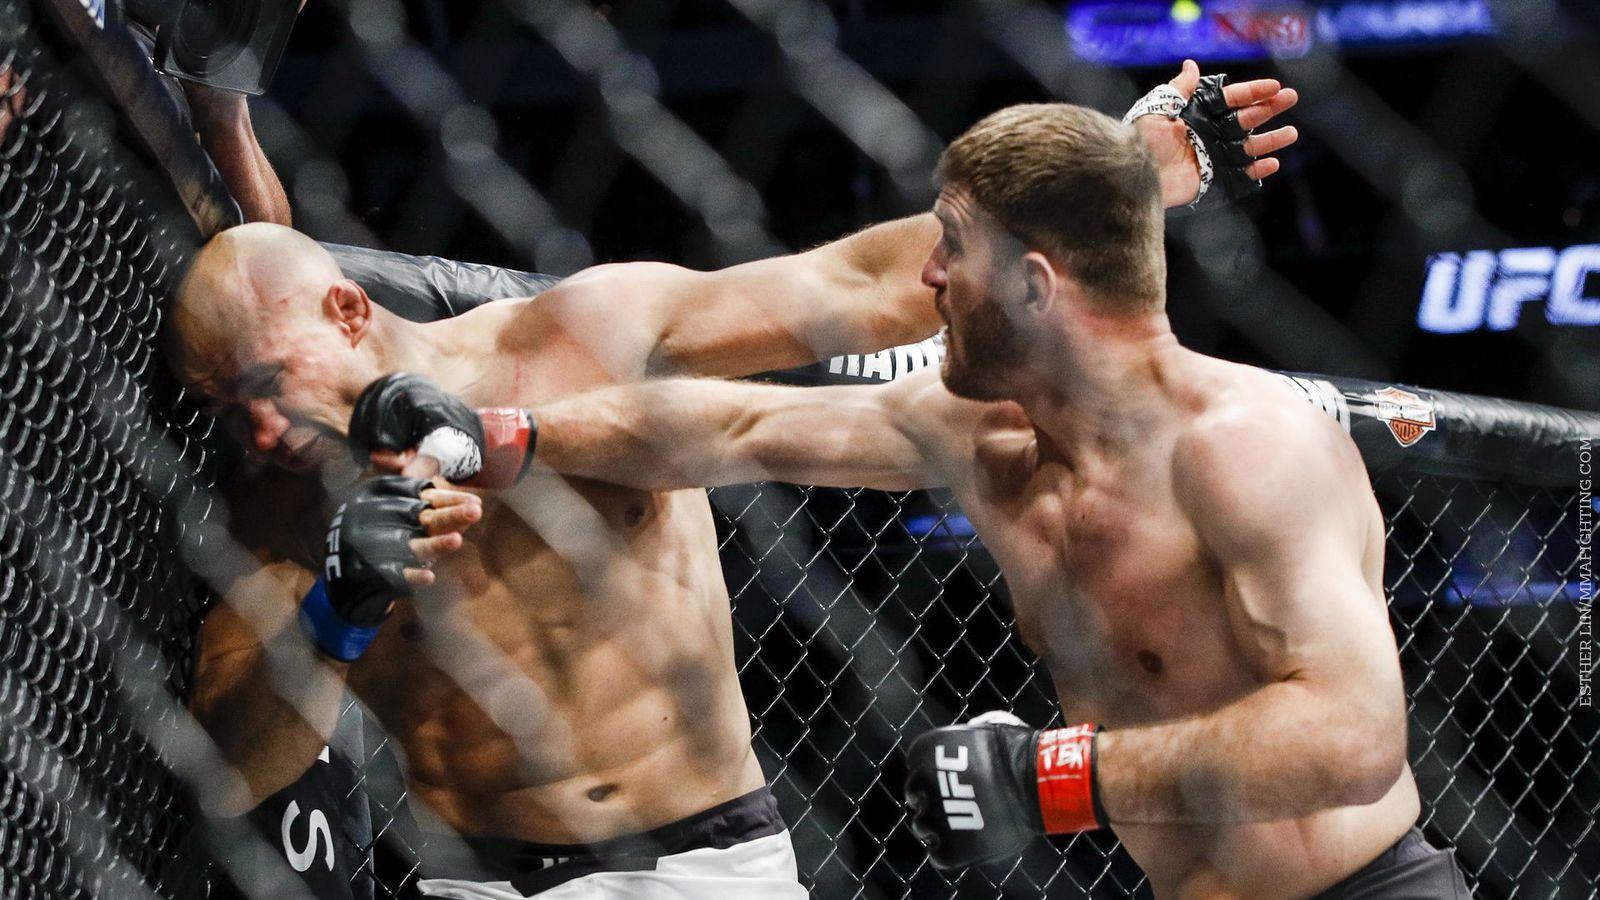 UFC 211 results: Stipe Miocic knocks out Junior dos Santos in first round